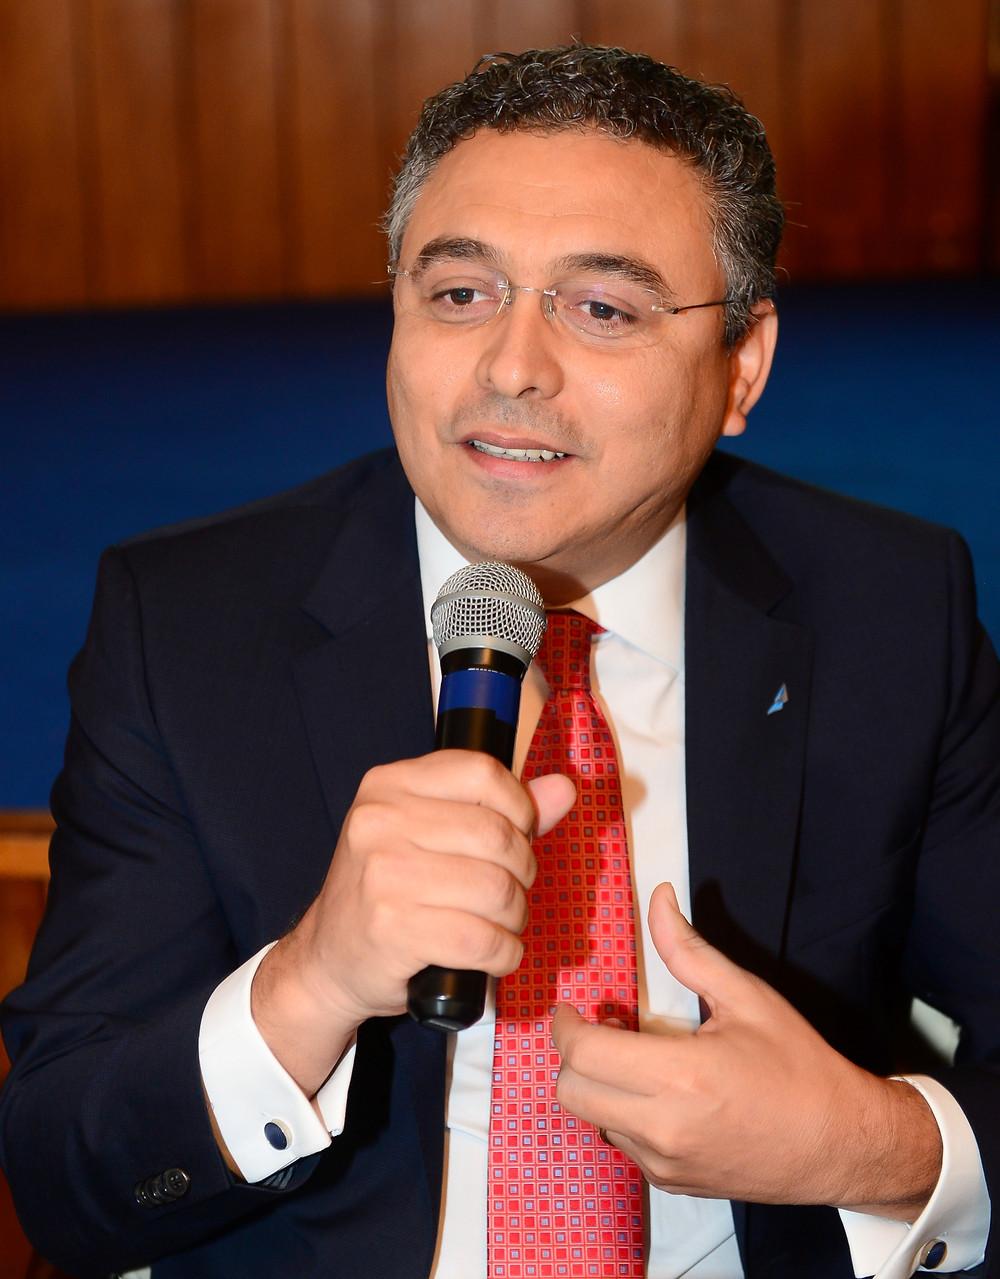 Salvatore Lombardi Junior, diretor de transportes da Argo Seguros